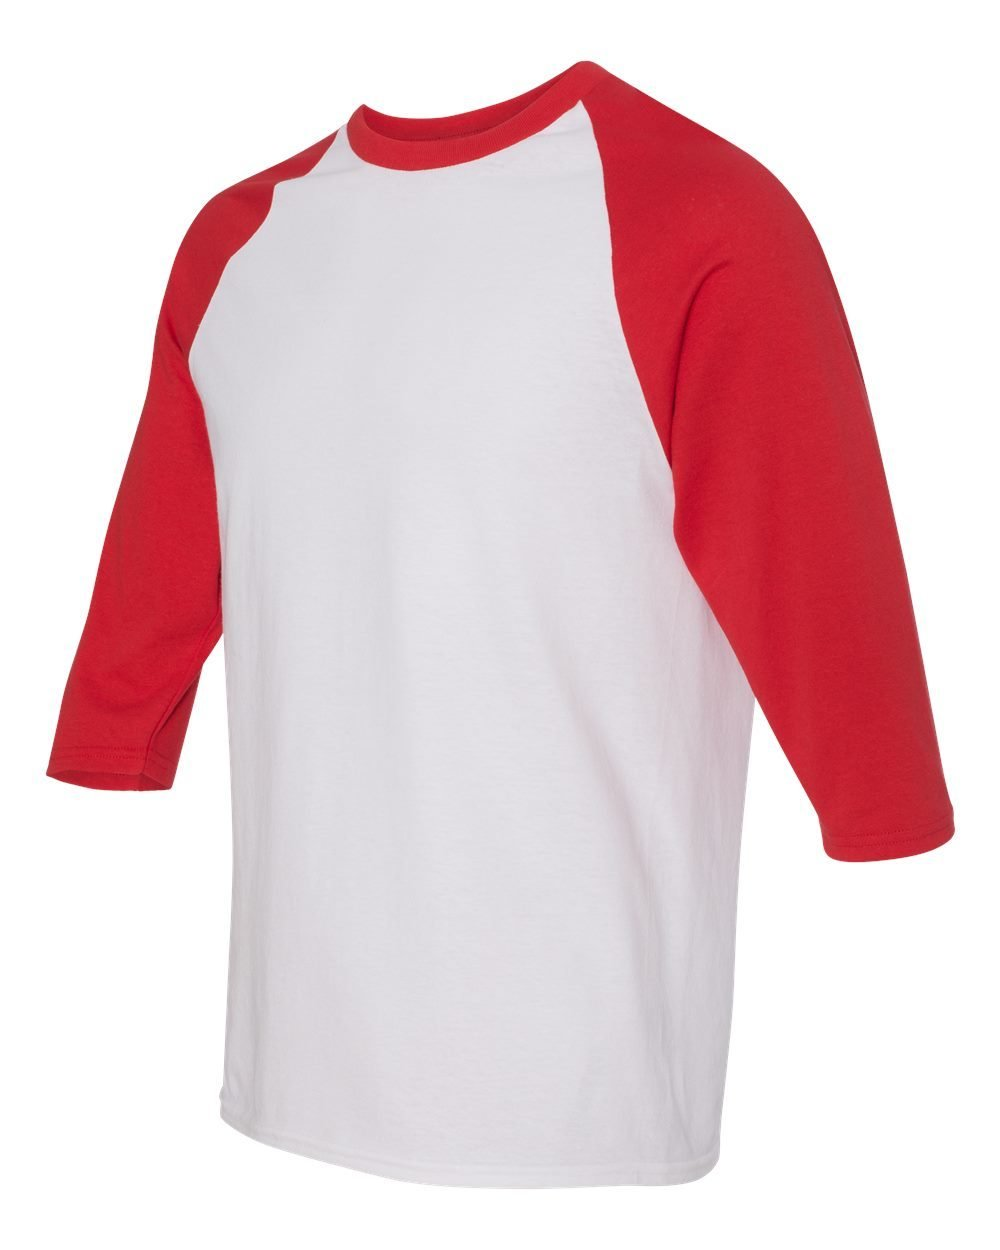 Heavy Cotton Three-Quarter Raglan Sleeve Baseball T-Shirt